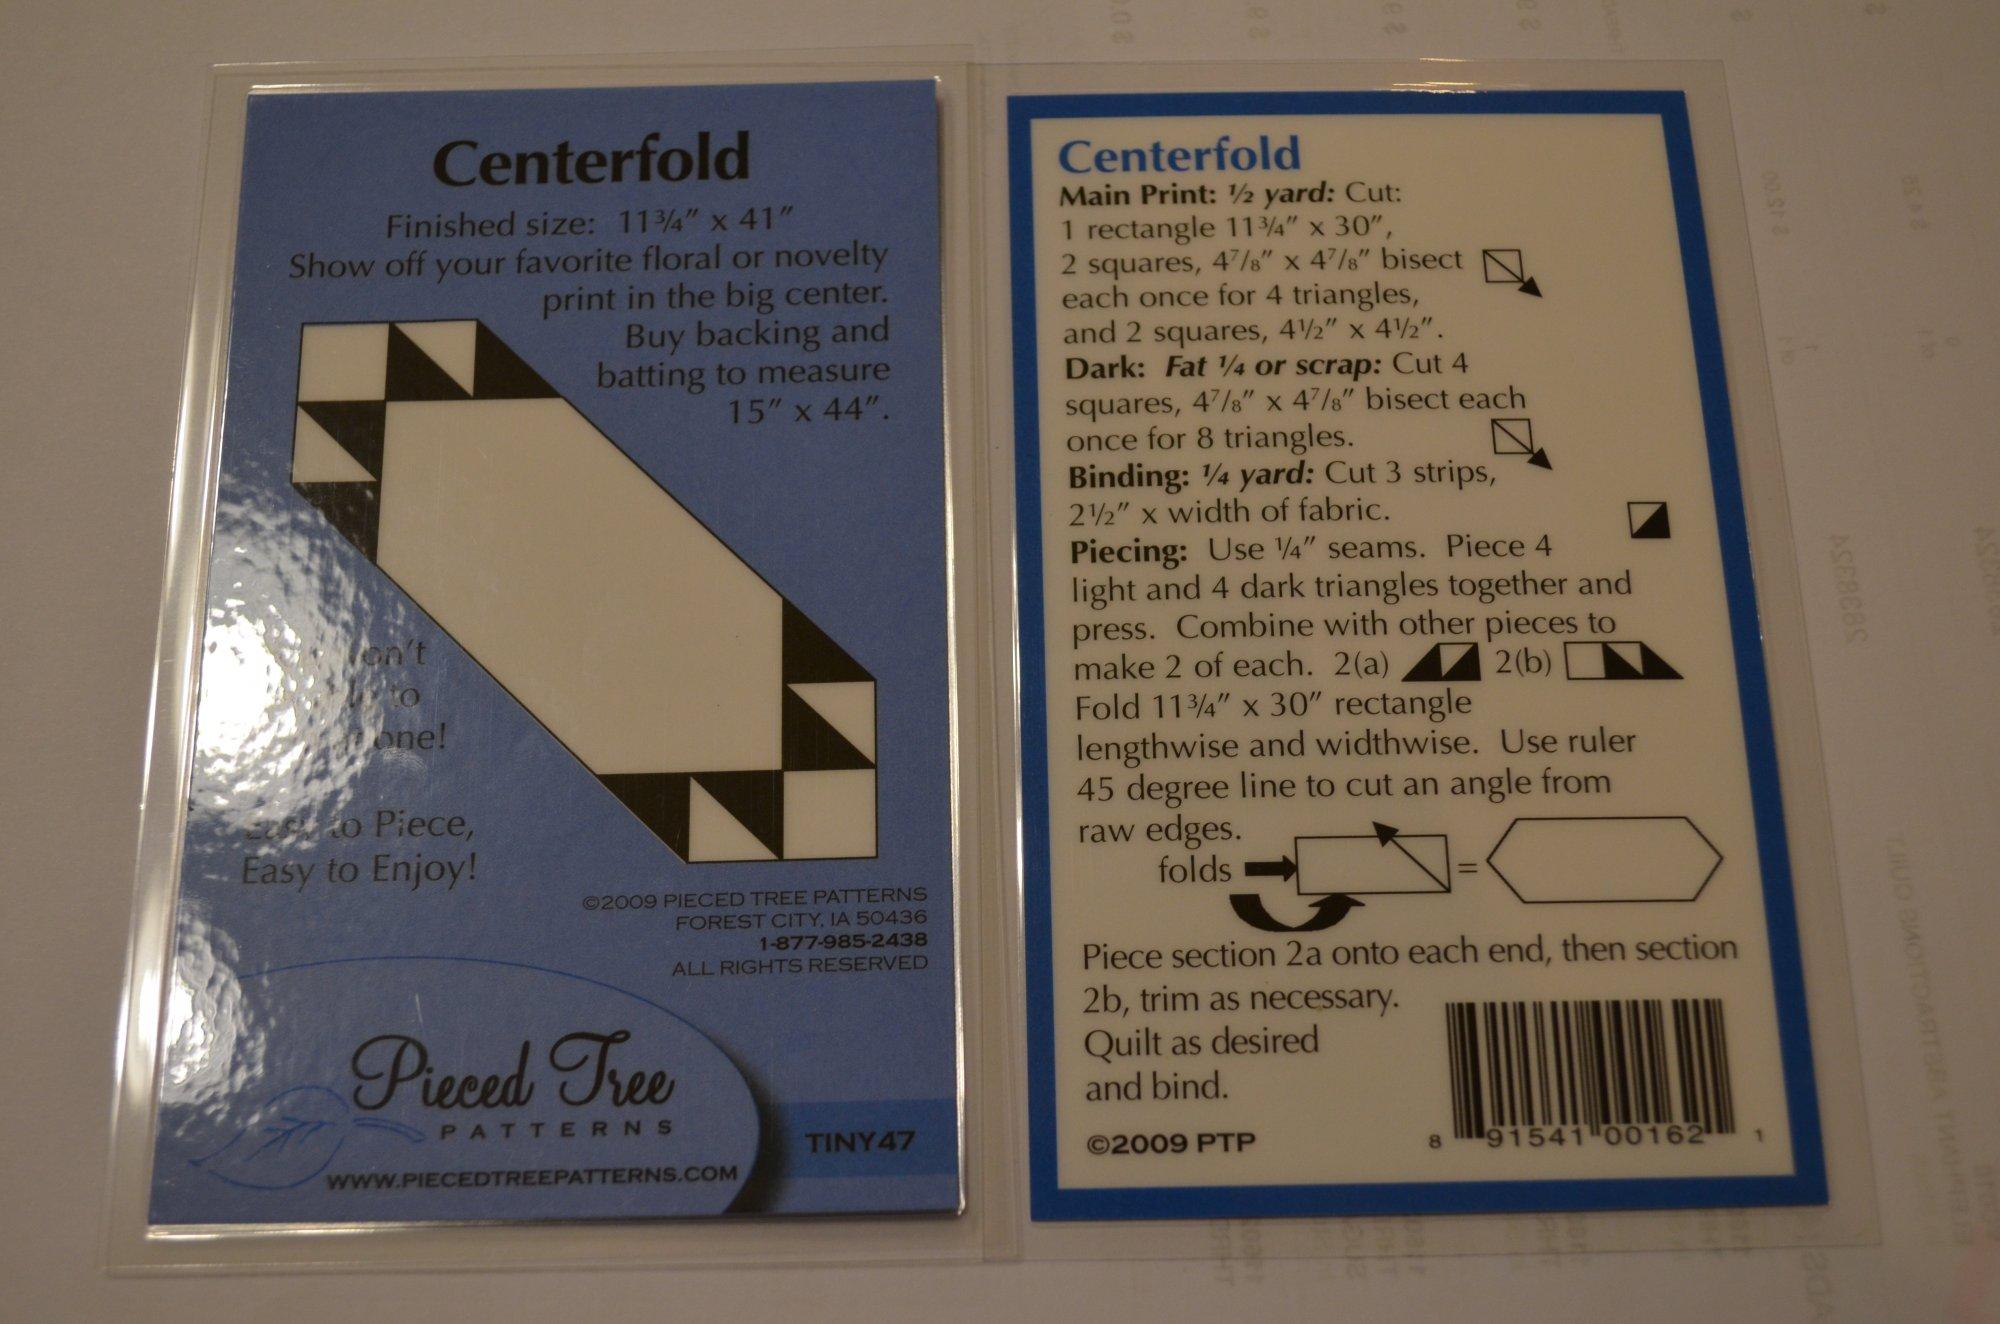 Centerfold Table Runner Pattern TINY47 PiecedTree